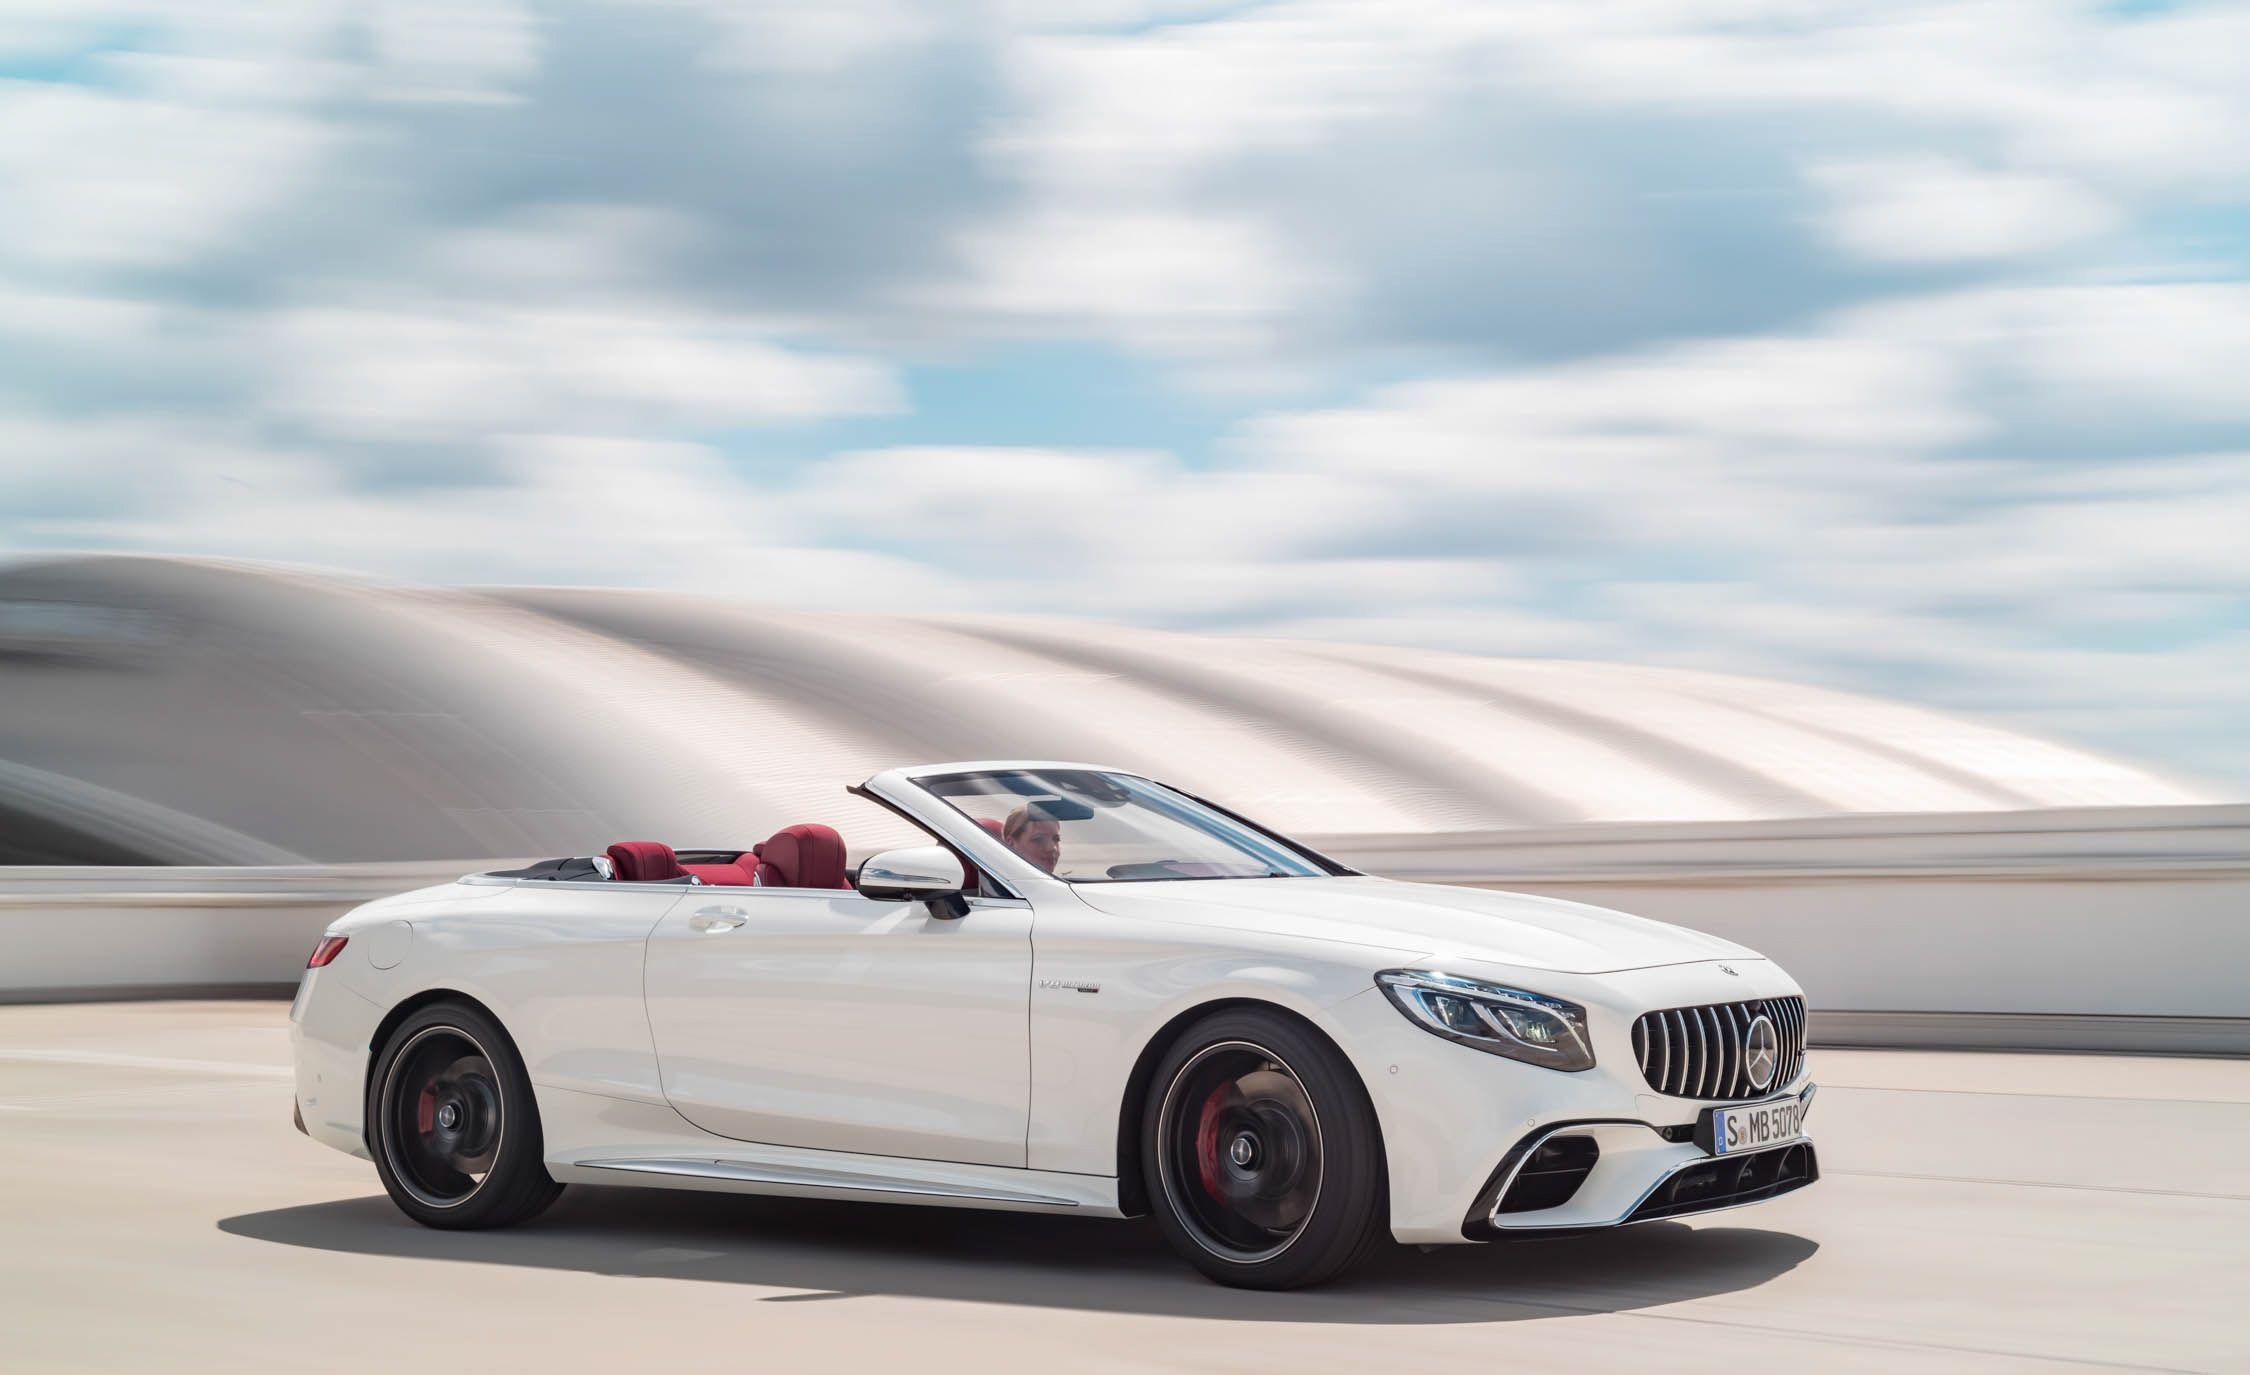 https://hips.hearstapps.com/amv-prod-cad-assets.s3.amazonaws.com/wp-content/uploads/2017/09/Mercedes-Benz-S-Class-110-1.jpg